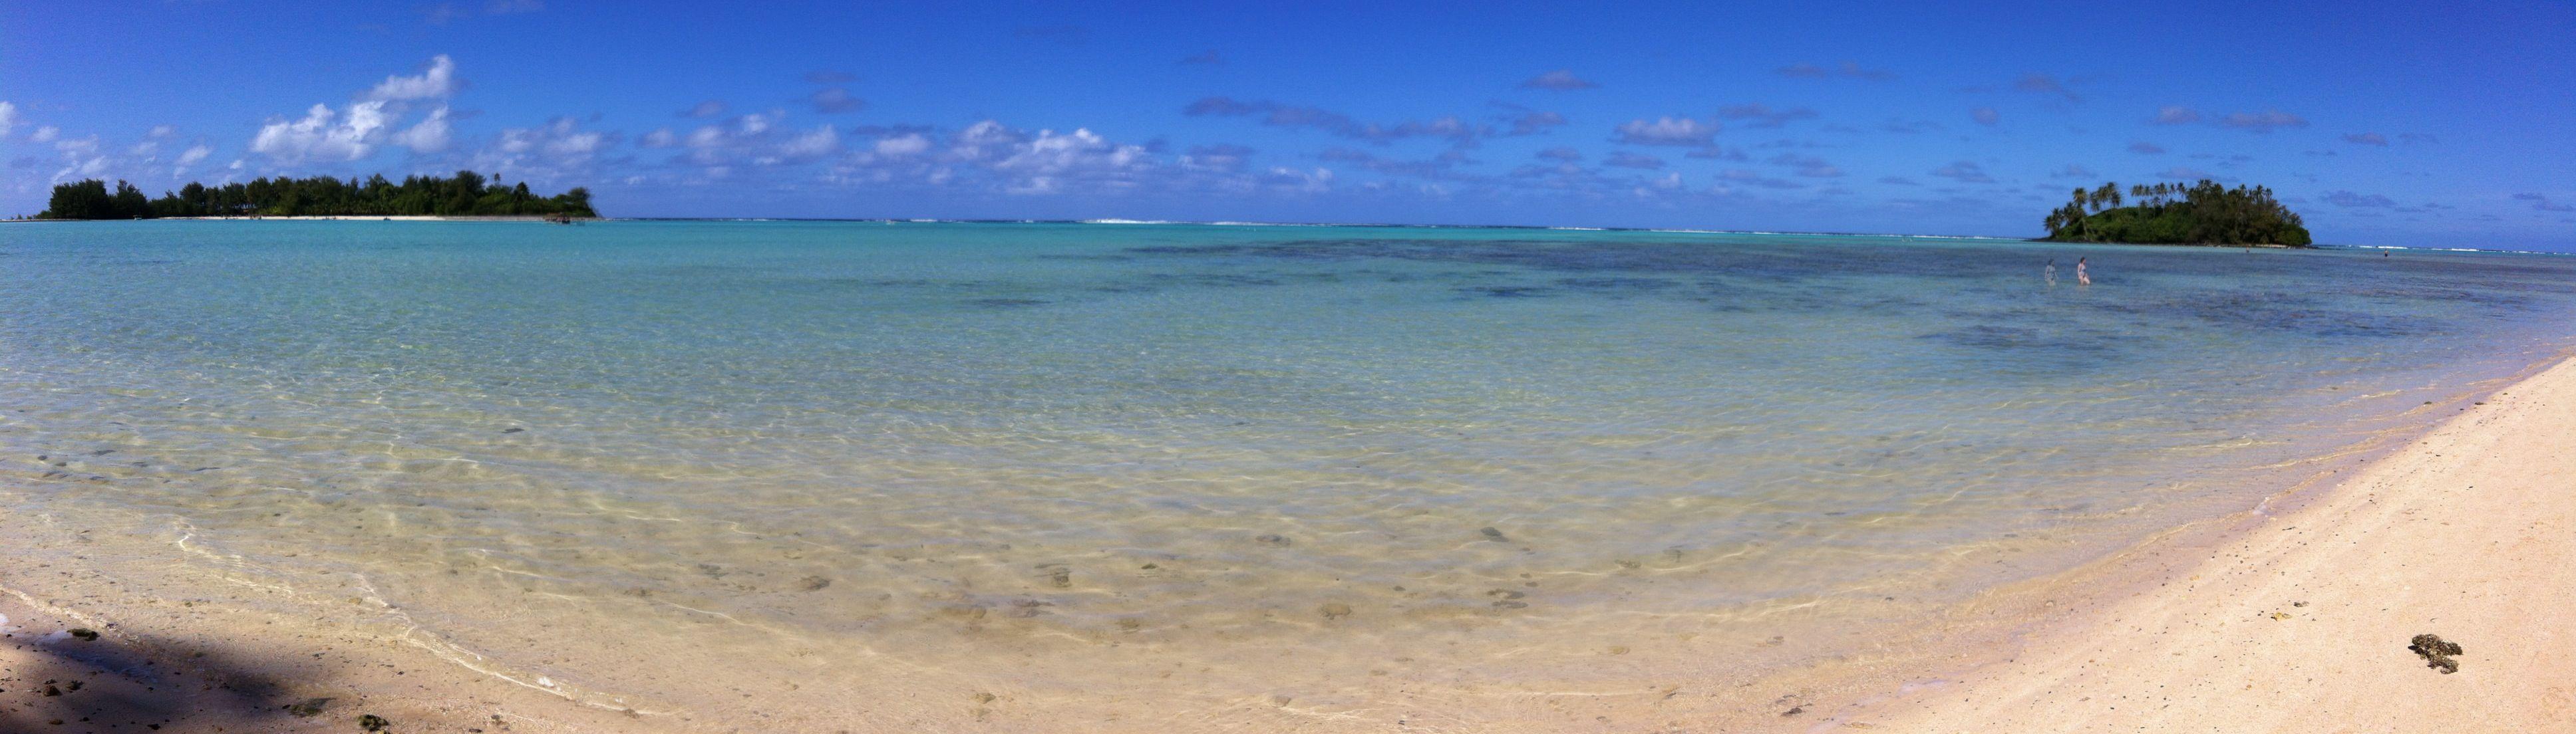 Muri Lagoon, Cook Islands